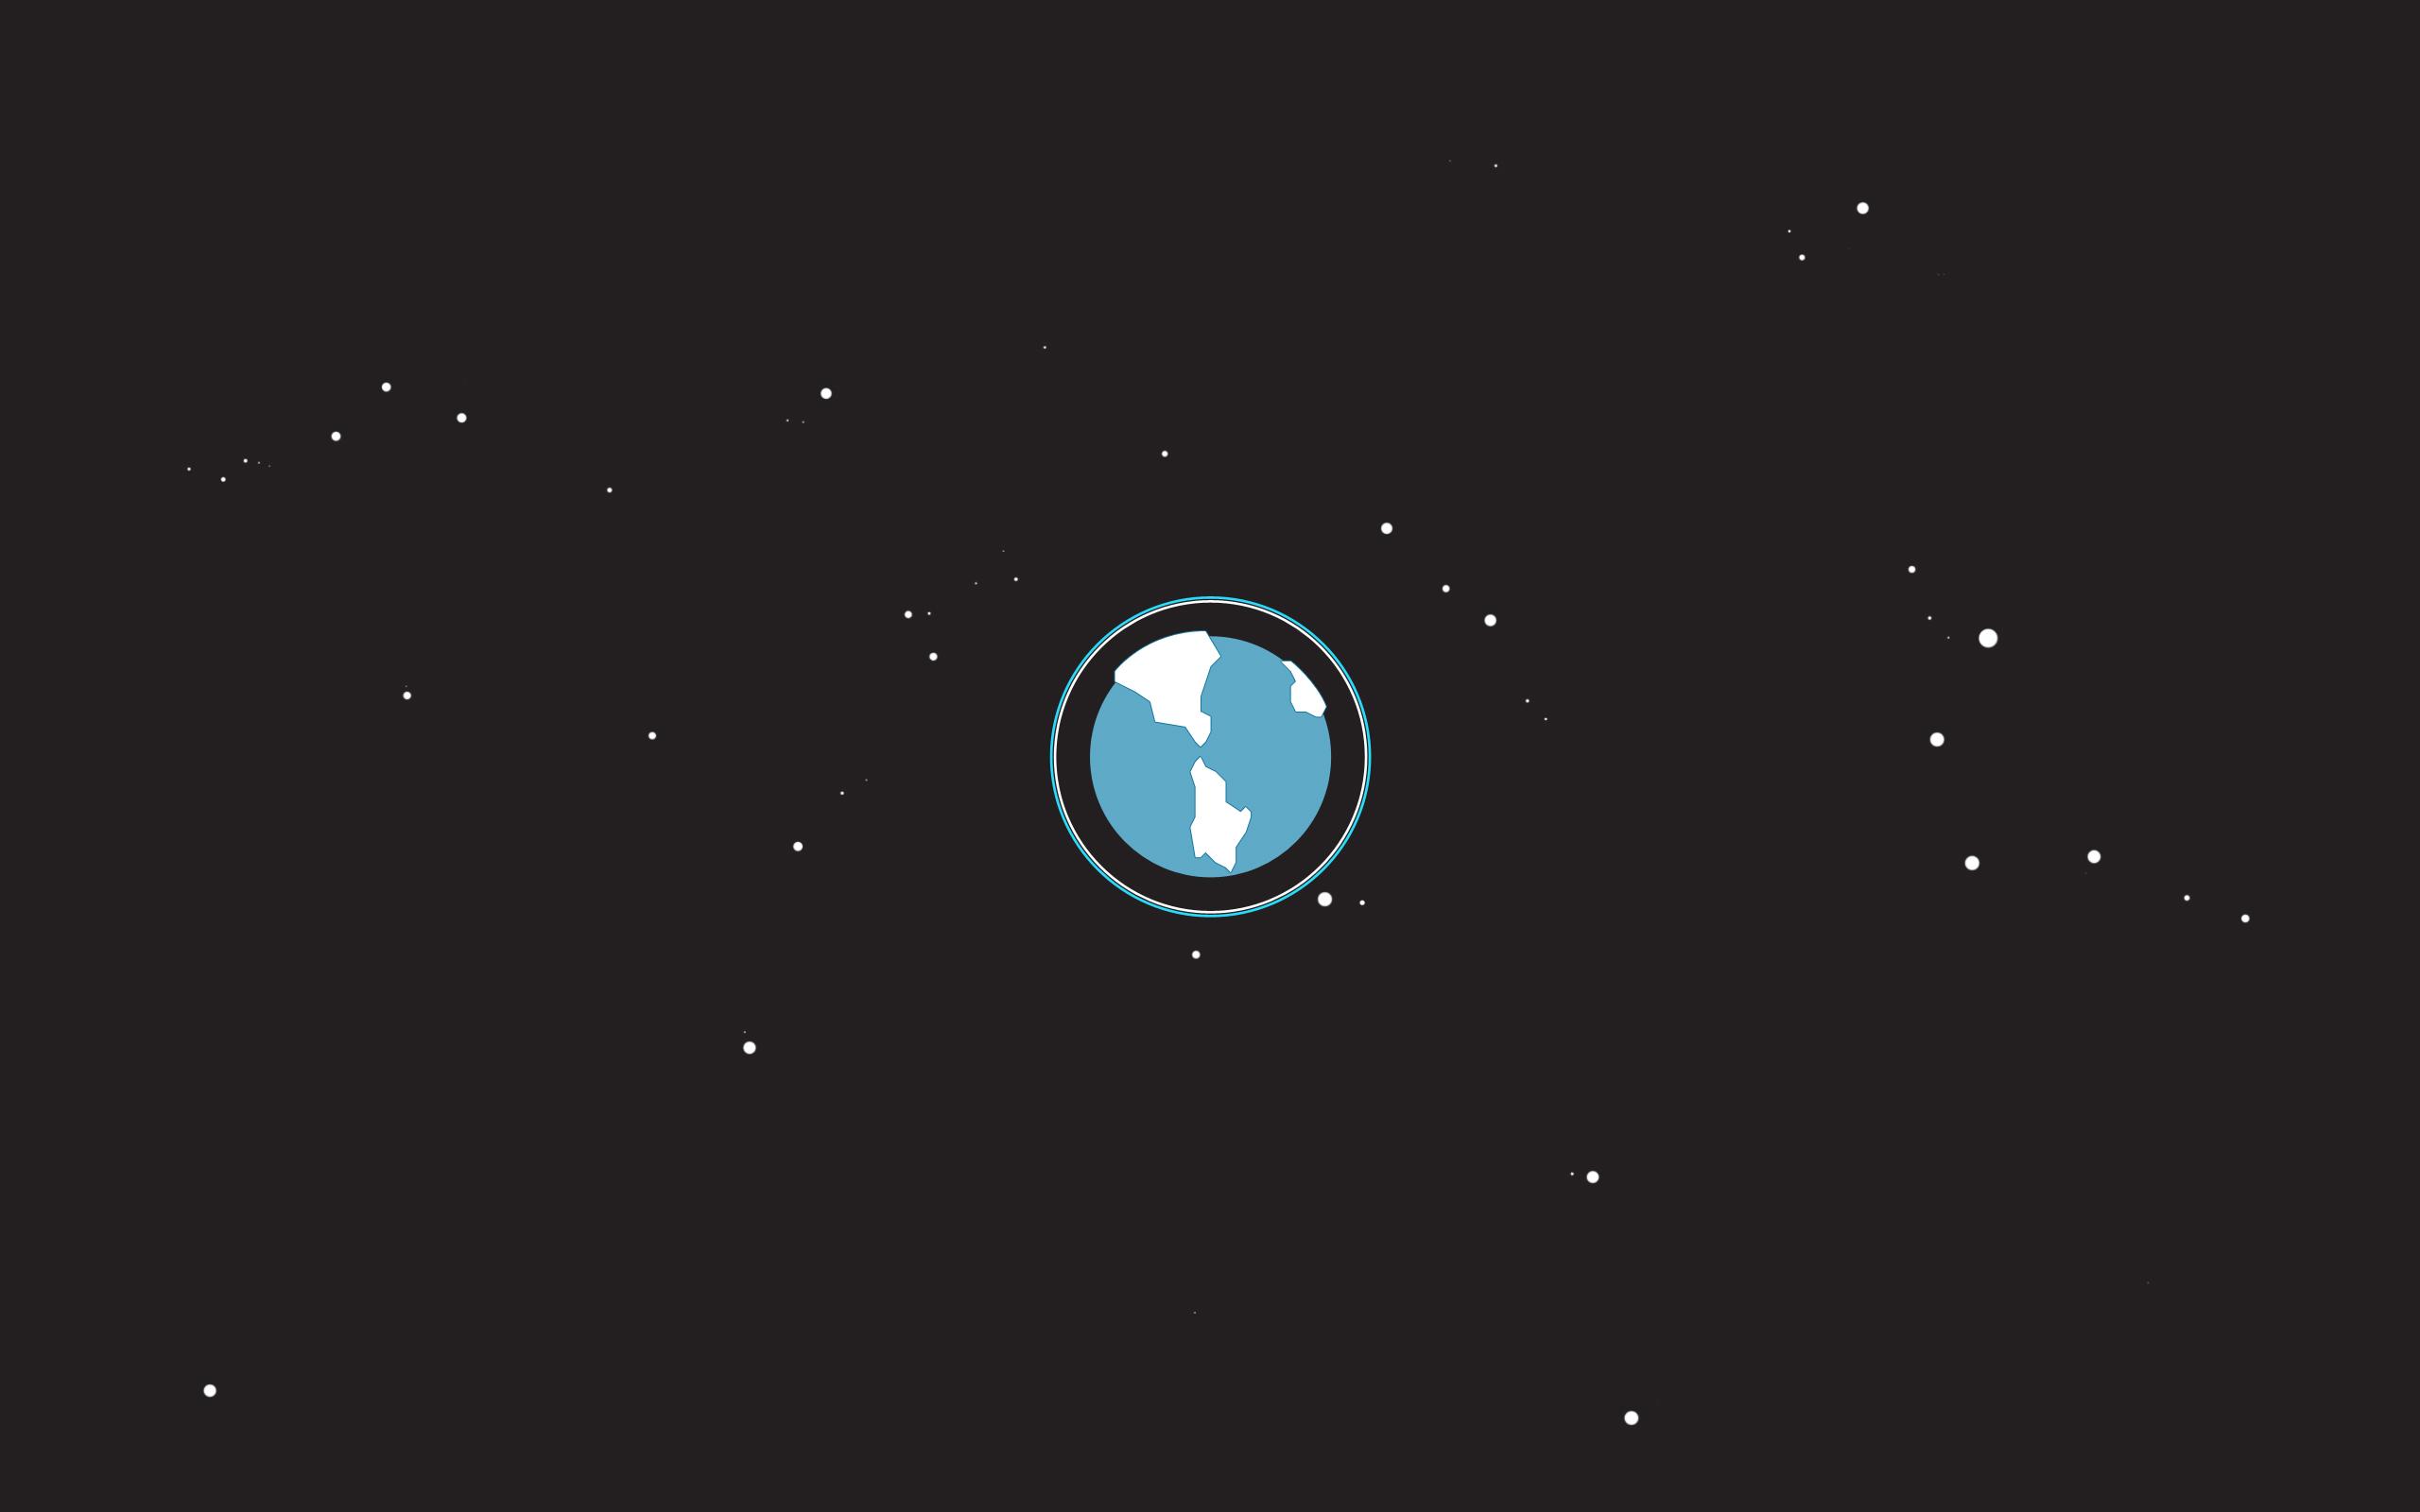 DESKTOP]Earth by Simon Gustavsson on Simple Desktops Download here 2560x1600